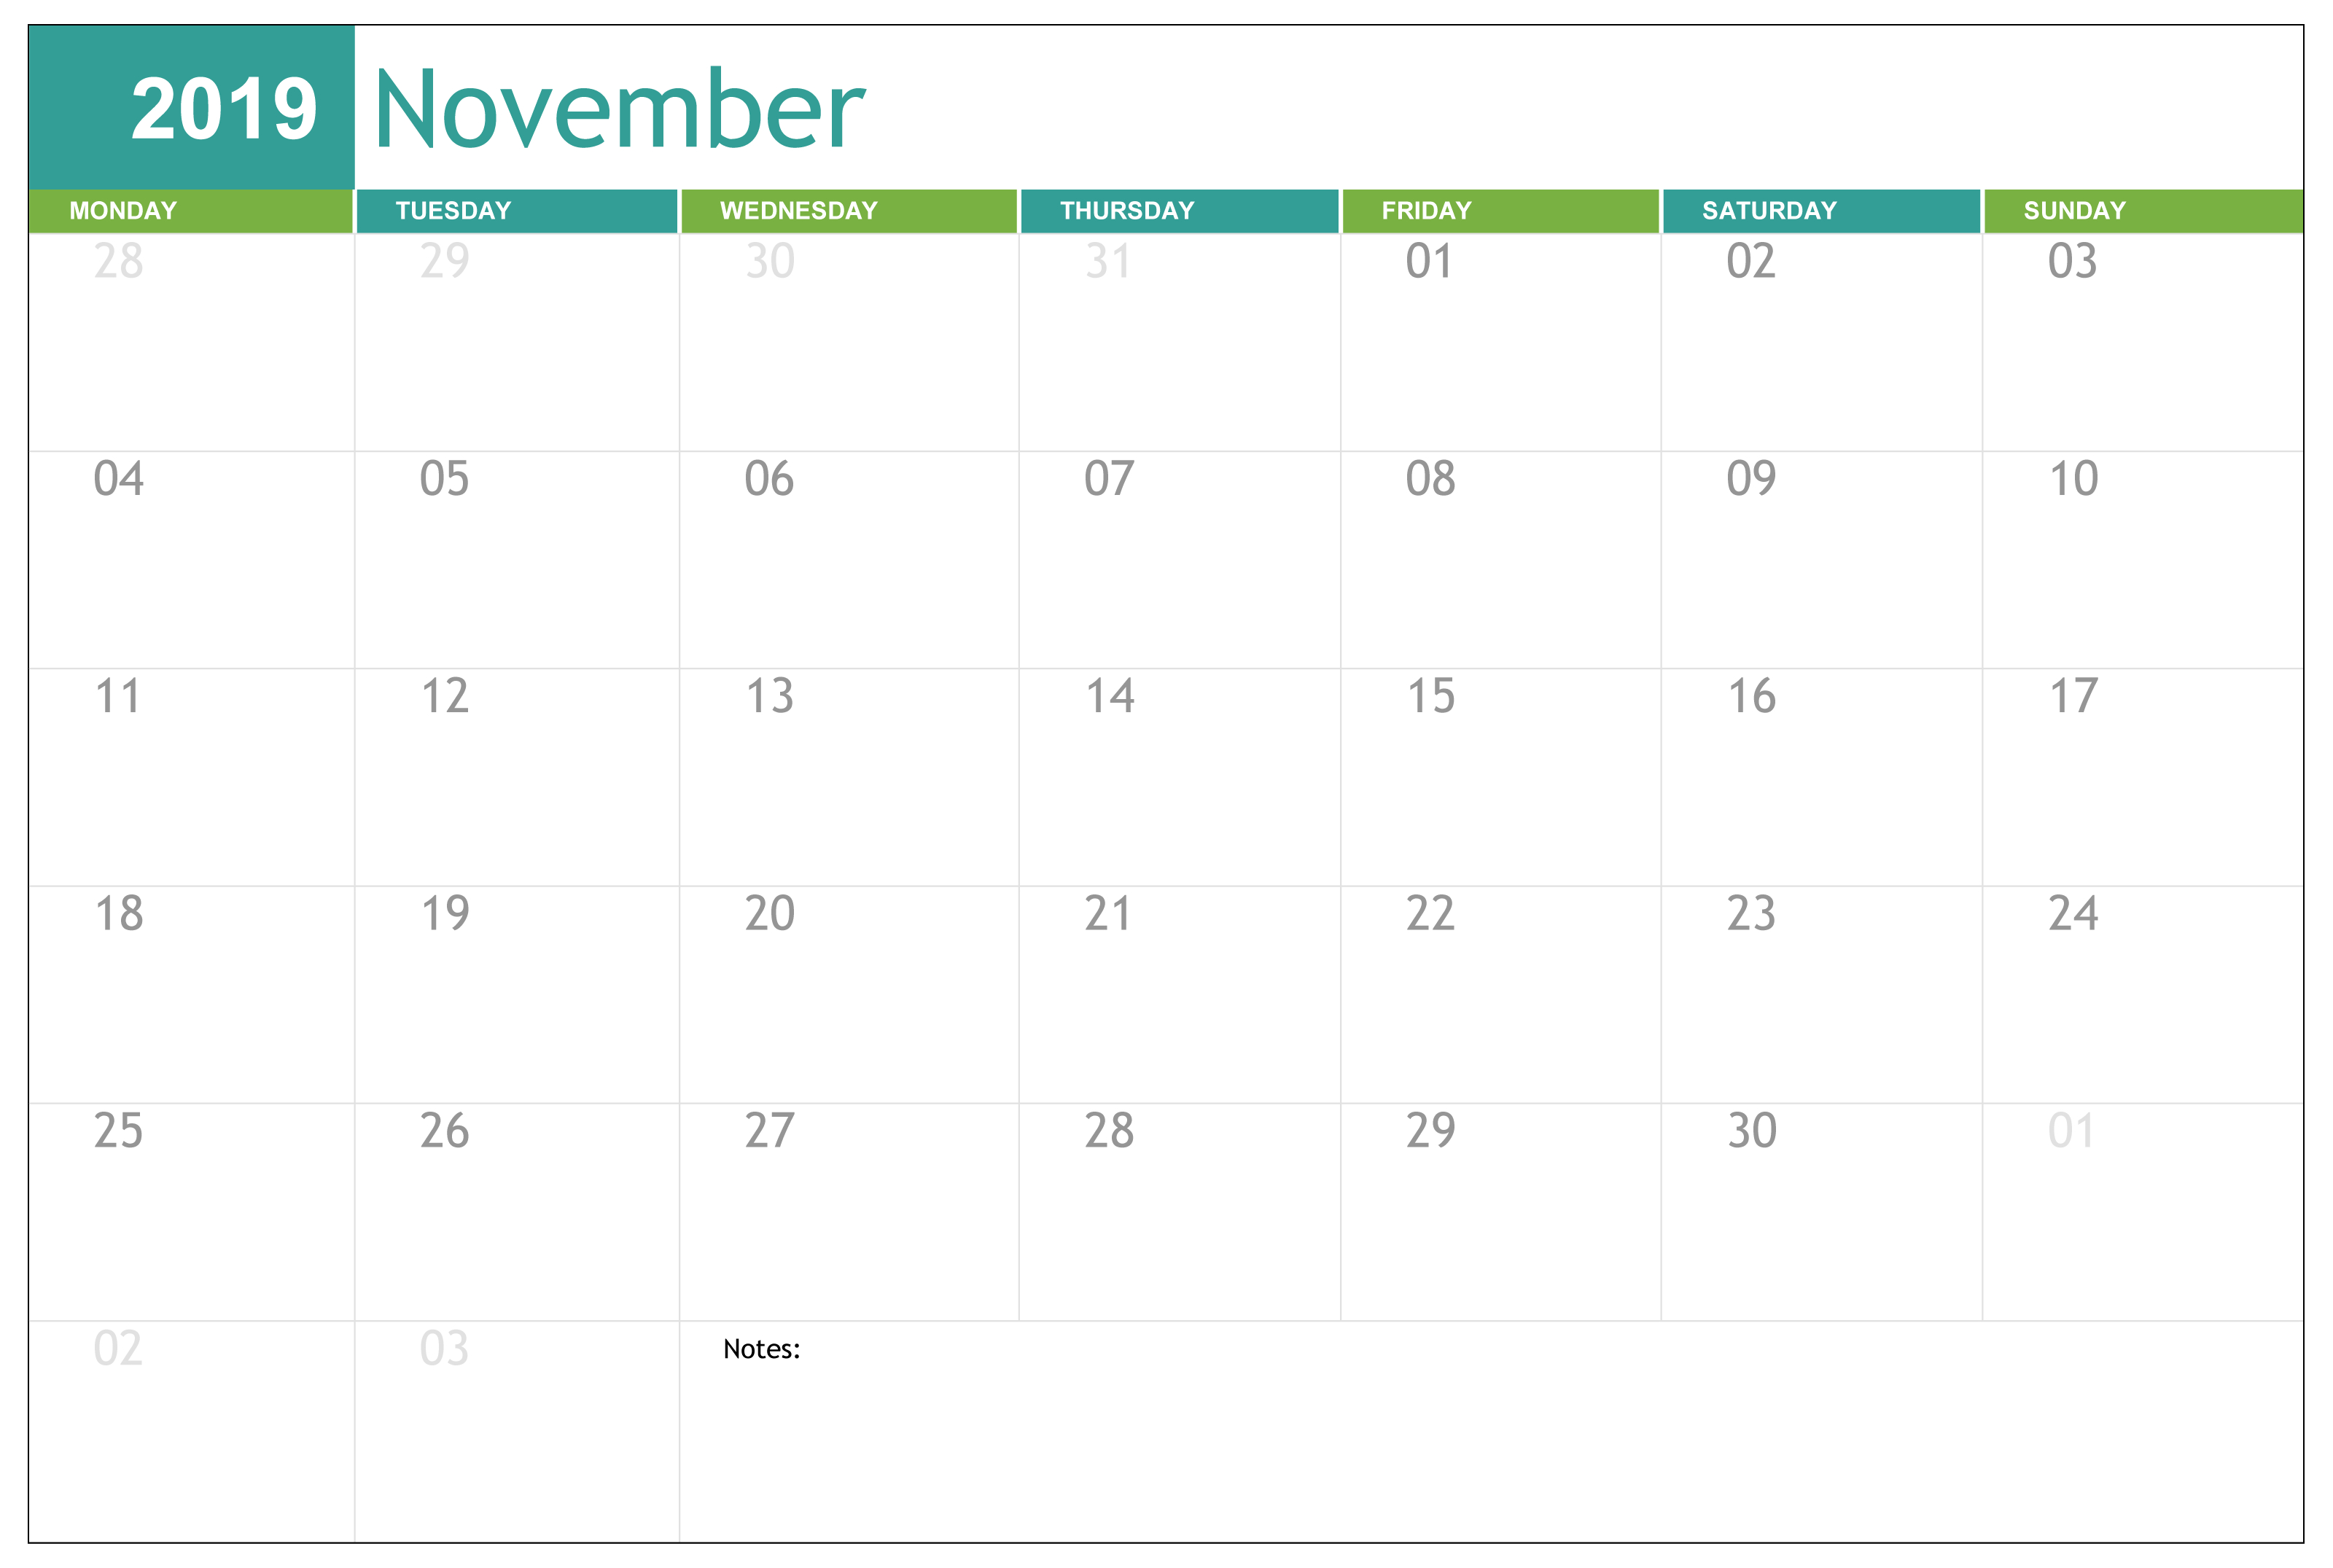 Free Printable November 2019 Calendar Excel - 2019 Calendars